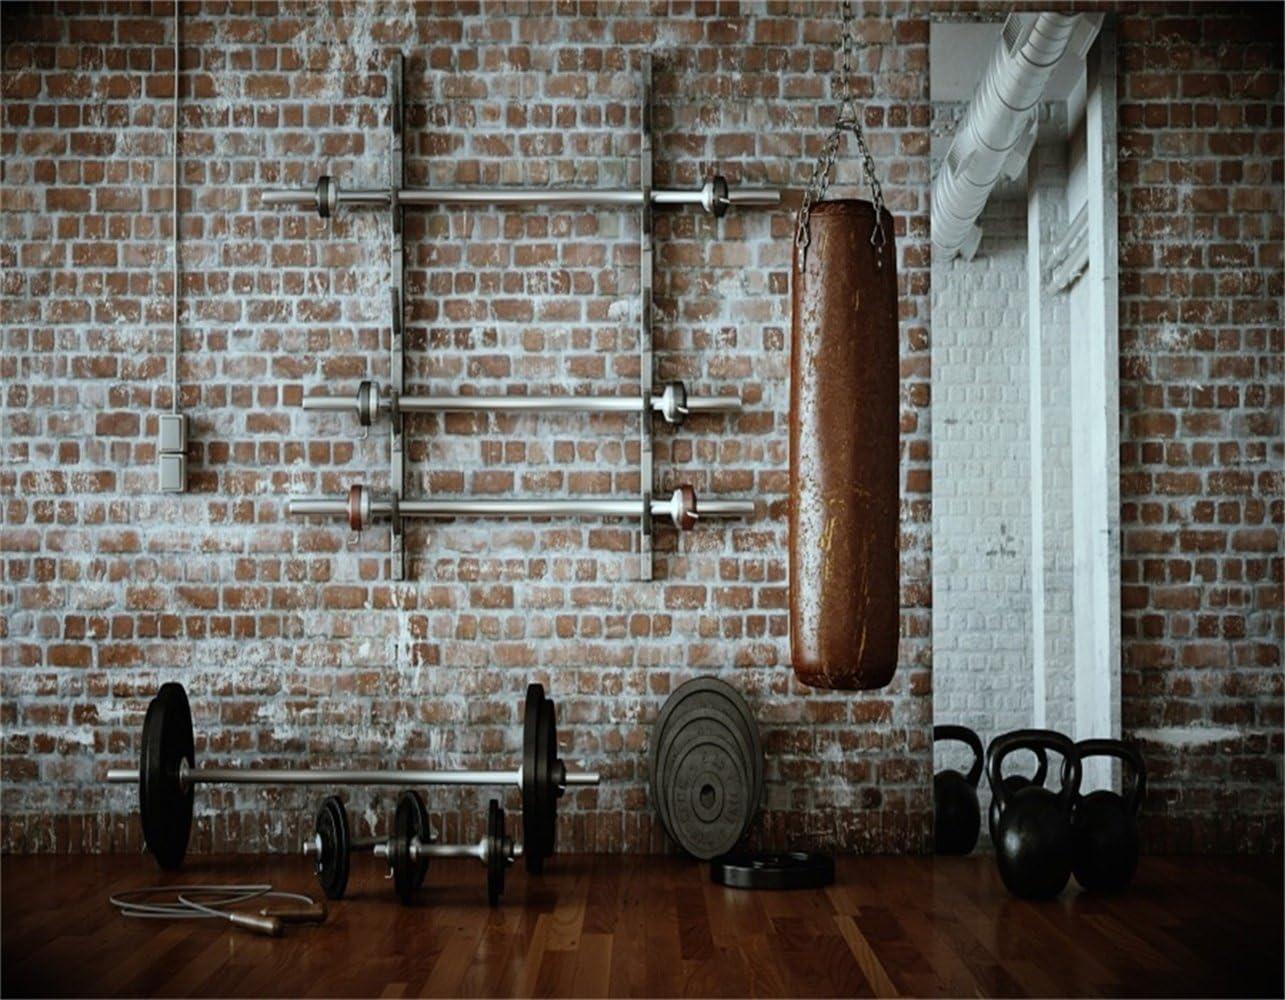 Amazon Com Aofoto 10x8ft Gym Dumbbell Backdrop Indoor Sports